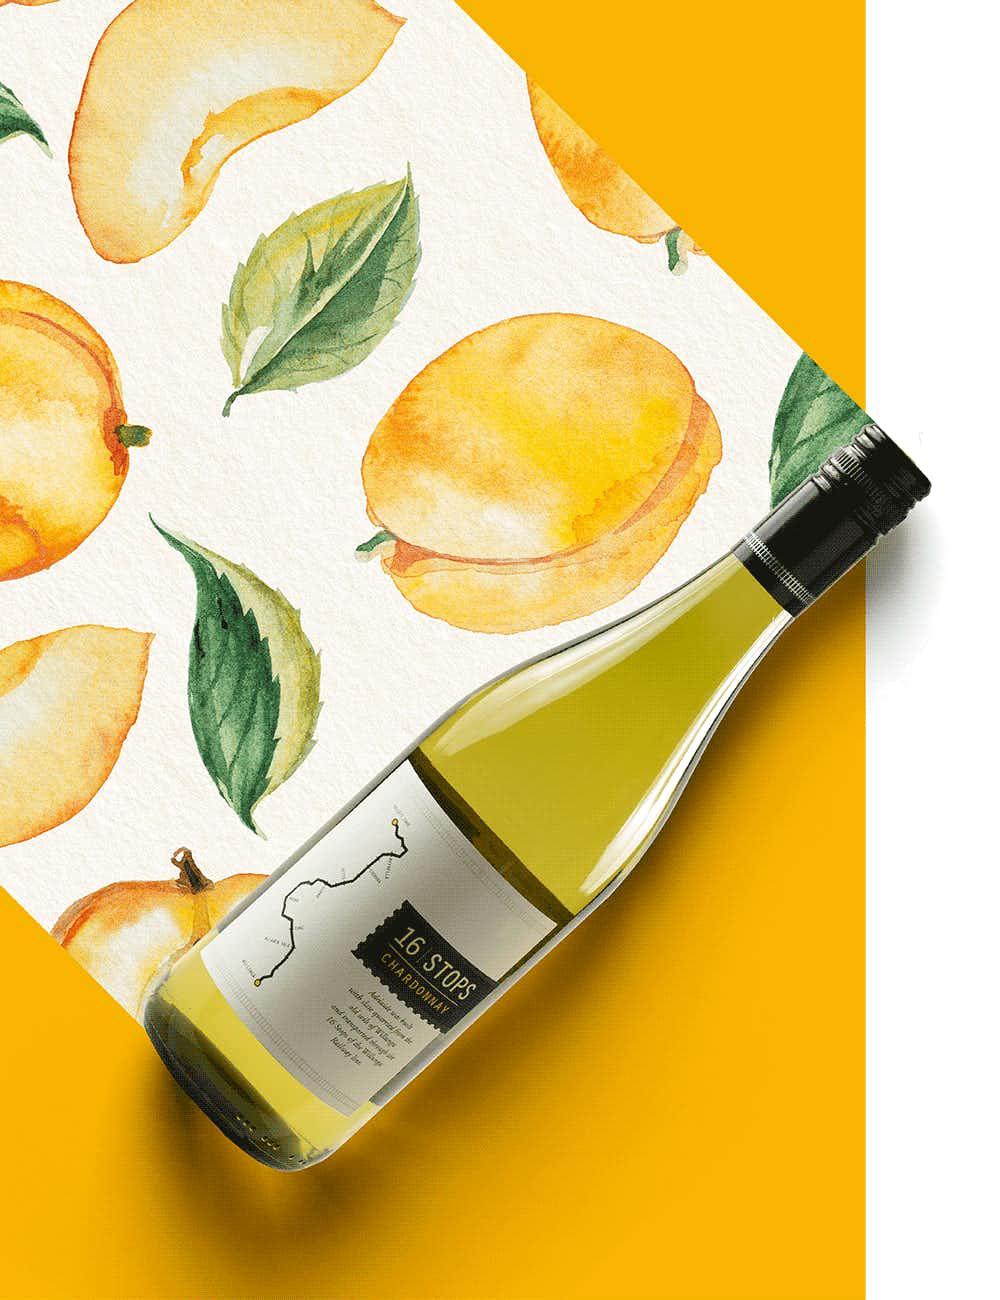 Willunga 100 16 Stops Chardonnay 2018